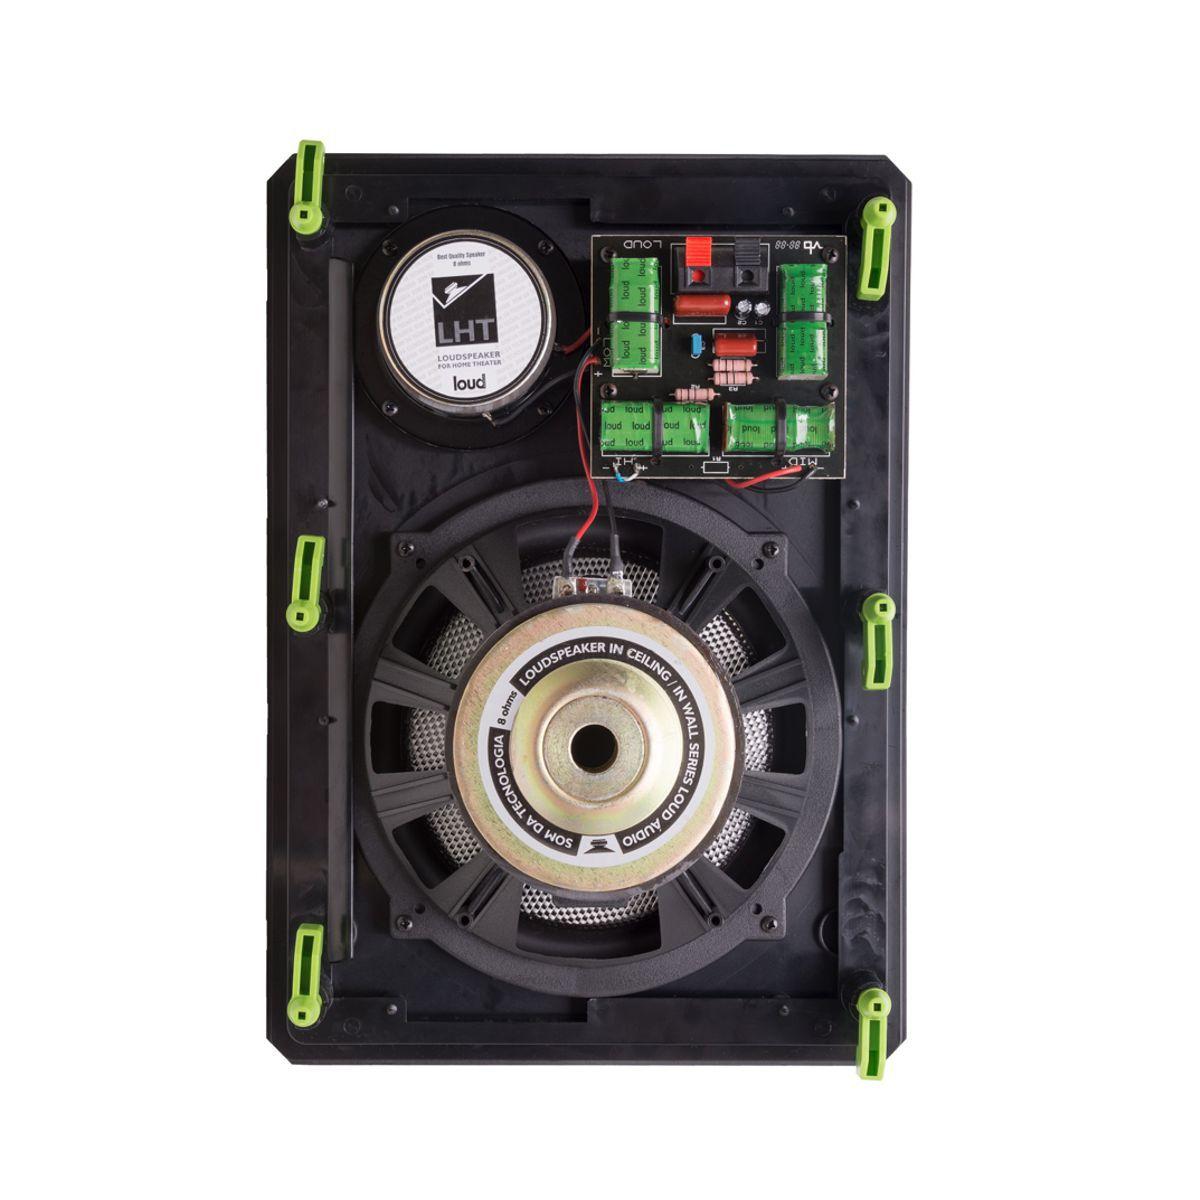 Kit 5.0.2 Dolby Atmos Caixa Acústica de Embutir LHT-100 BL + LHT TW-100 BL + CLK6-120 BL Loud